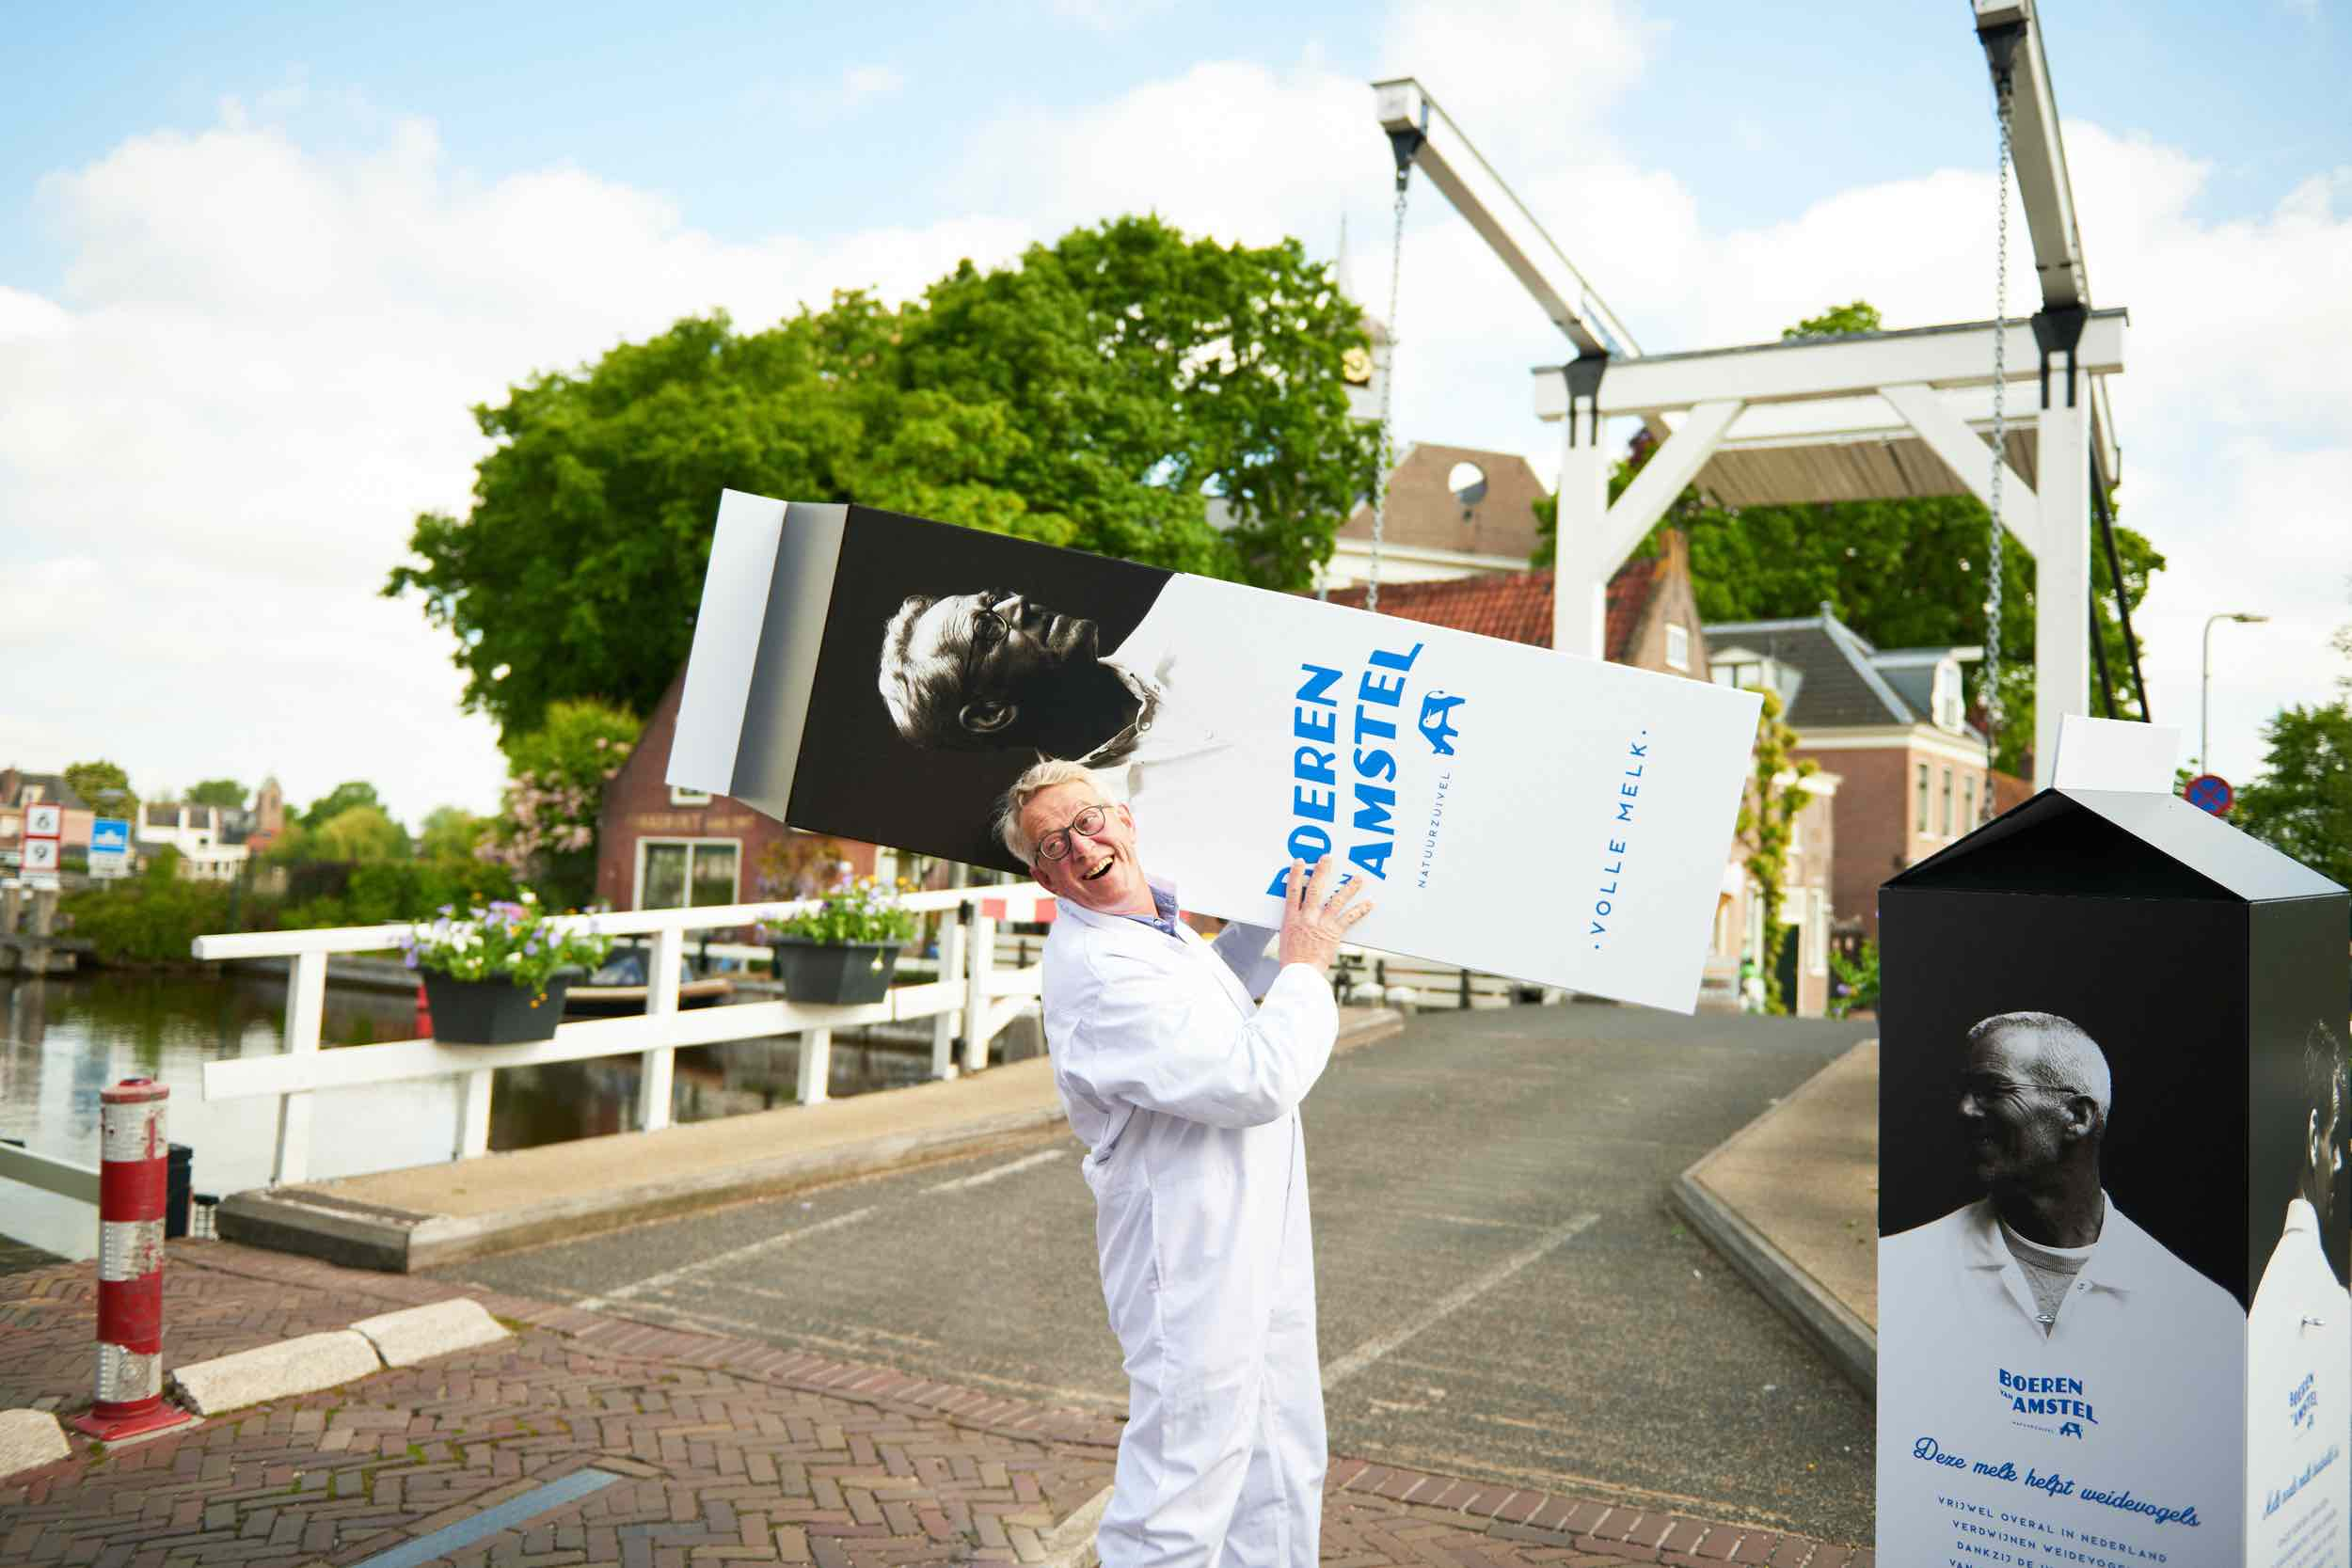 https://www.boerenvanamstel.nl/wp-content/uploads/2020/10/melk-boer-worden-boeren-van-amstel.jpg